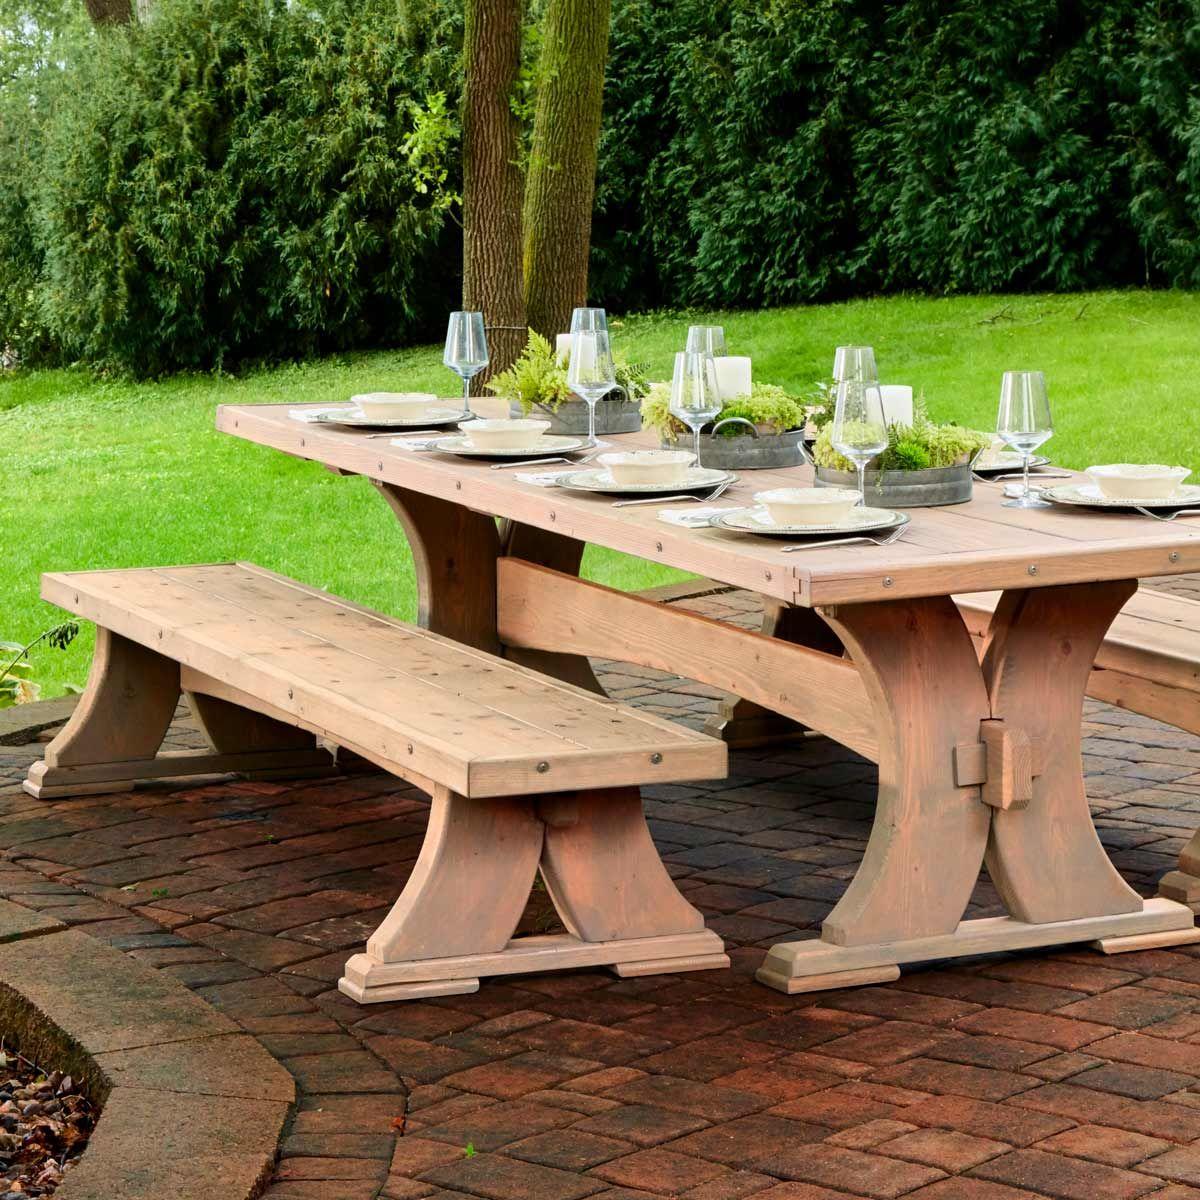 Heavy Duty Viking Bench Table Picnic Table Outdoor